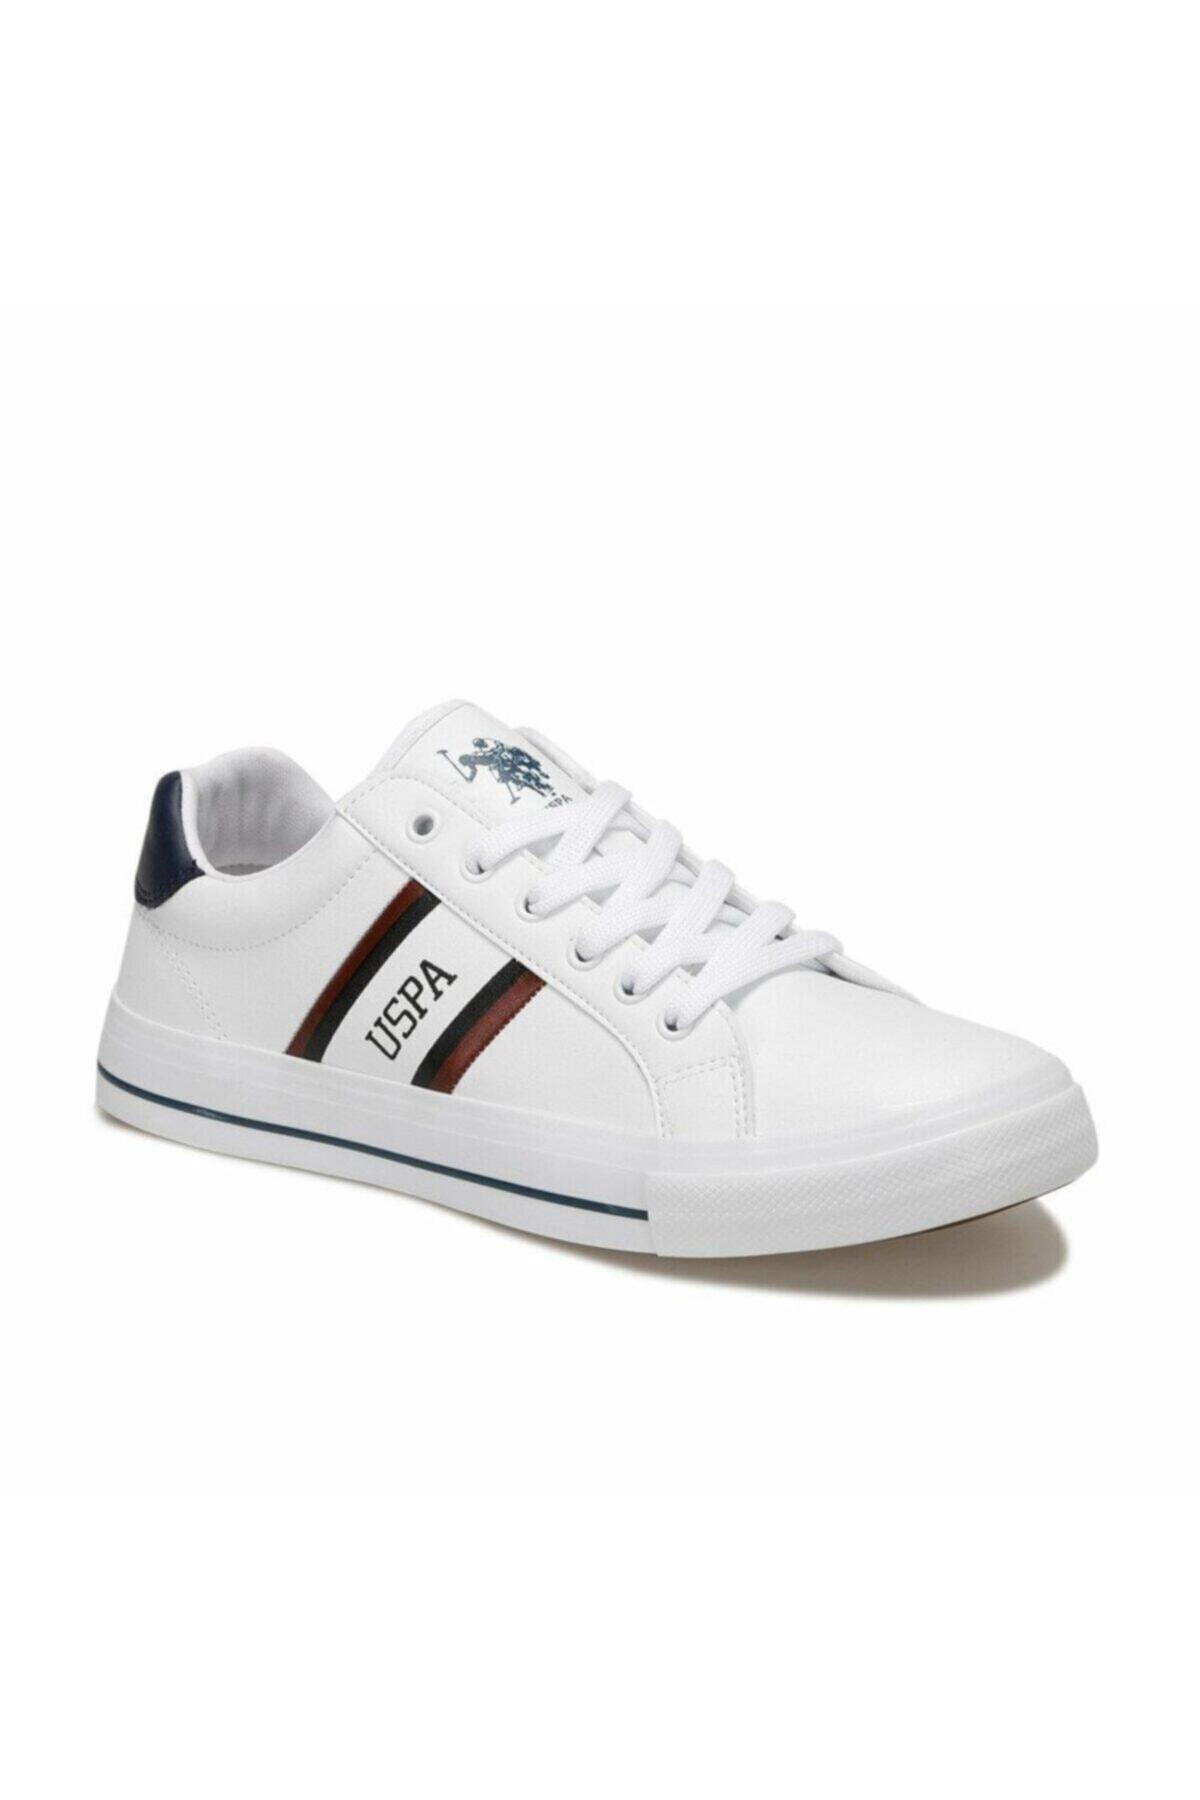 U.S. Polo Assn. PURE Beyaz Erkek Sneaker 100504852 2